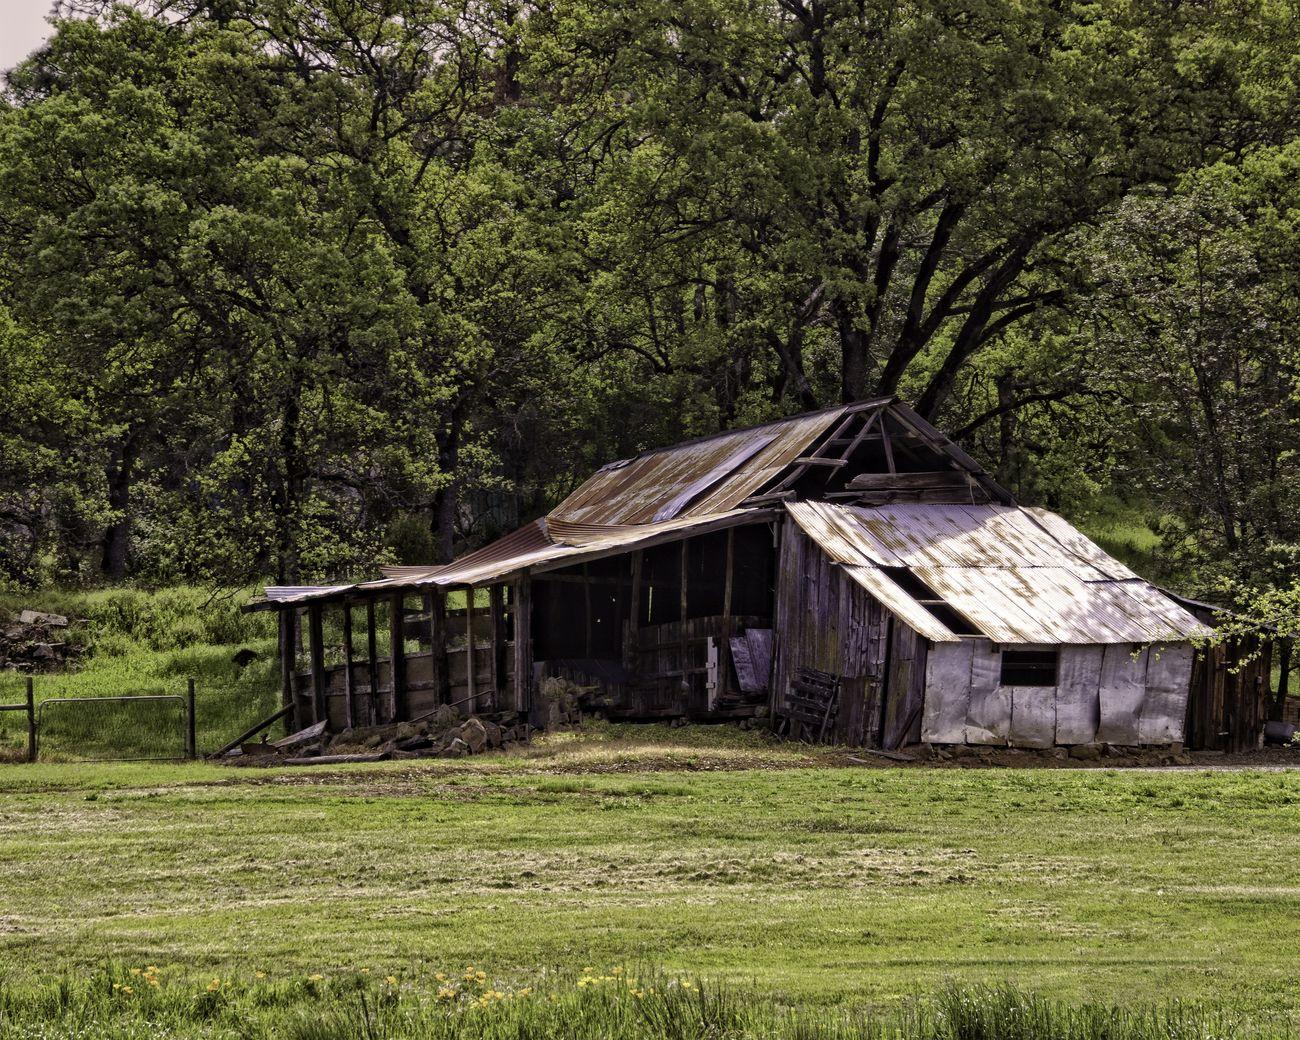 Barn on highway 49 in Auburn California